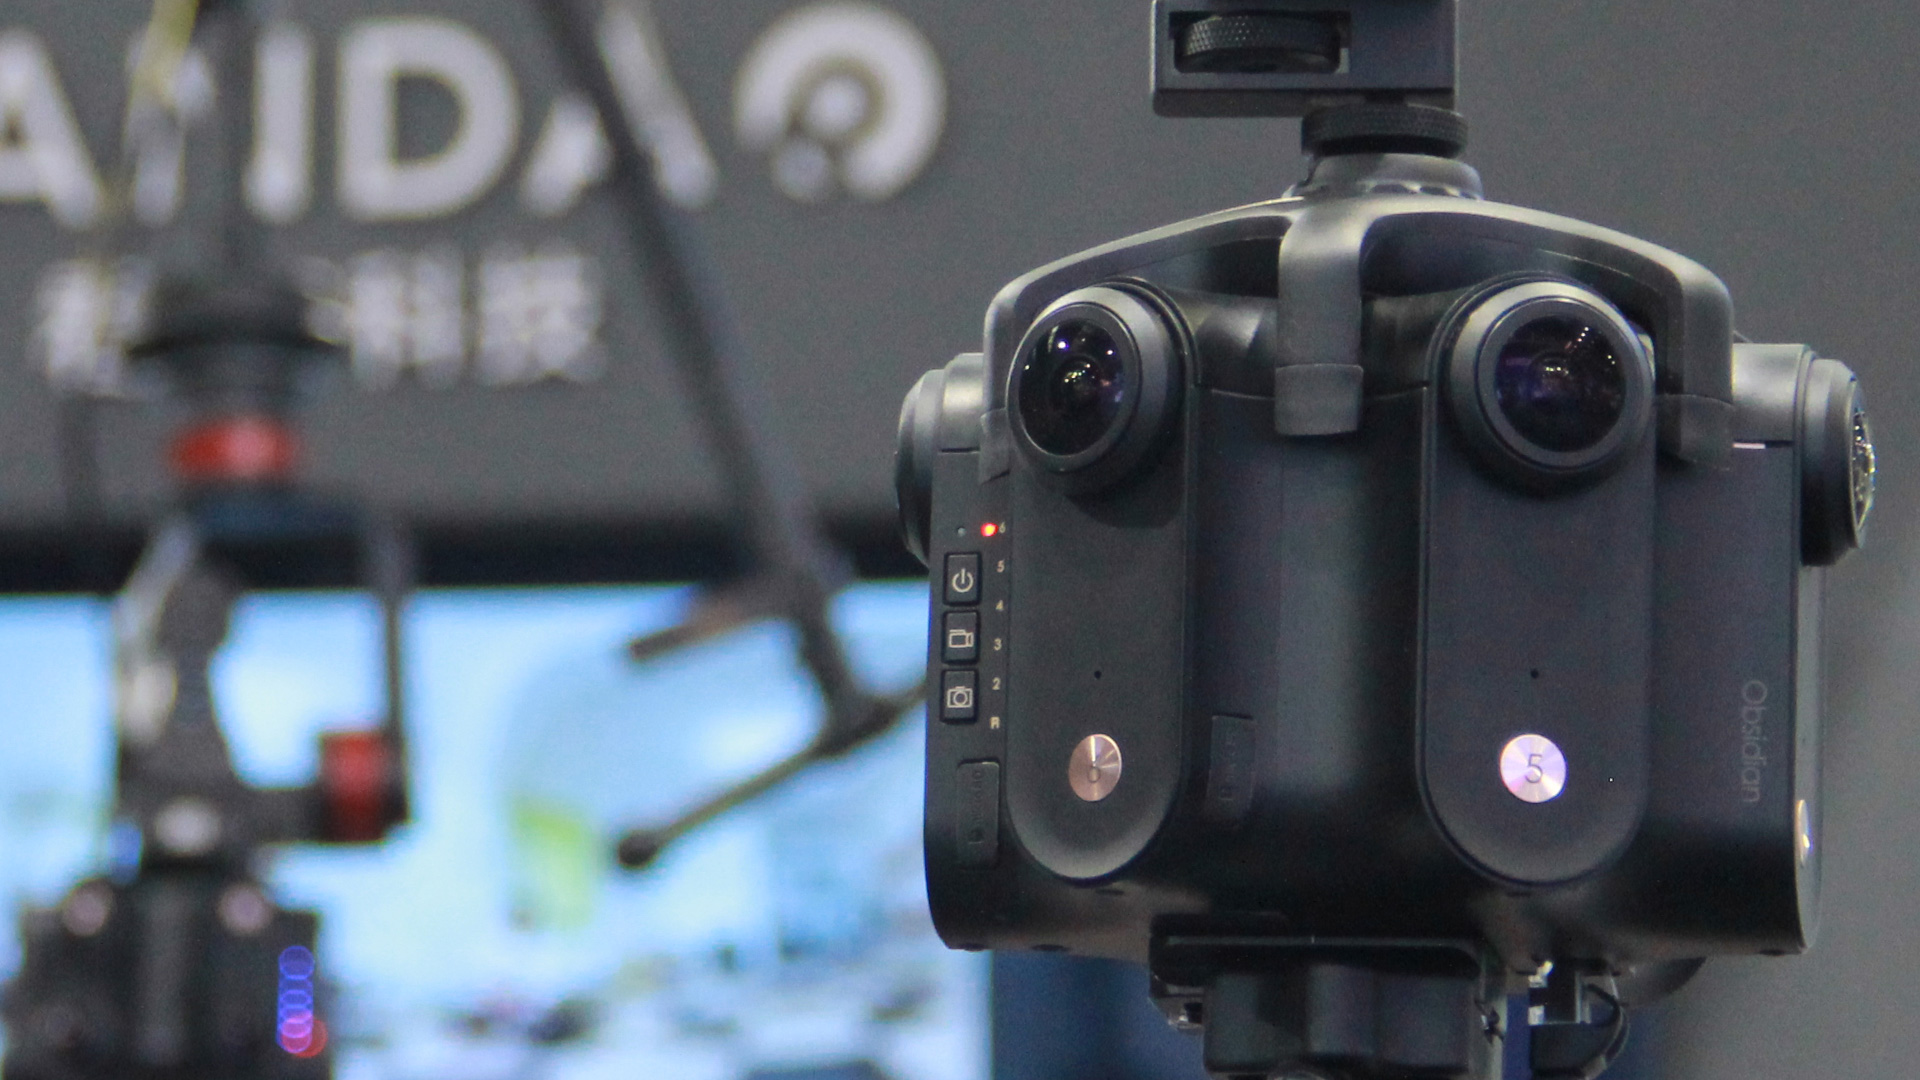 Kandaoが3D 8K VRシステムを開発 - 撮影から配信までをサポート